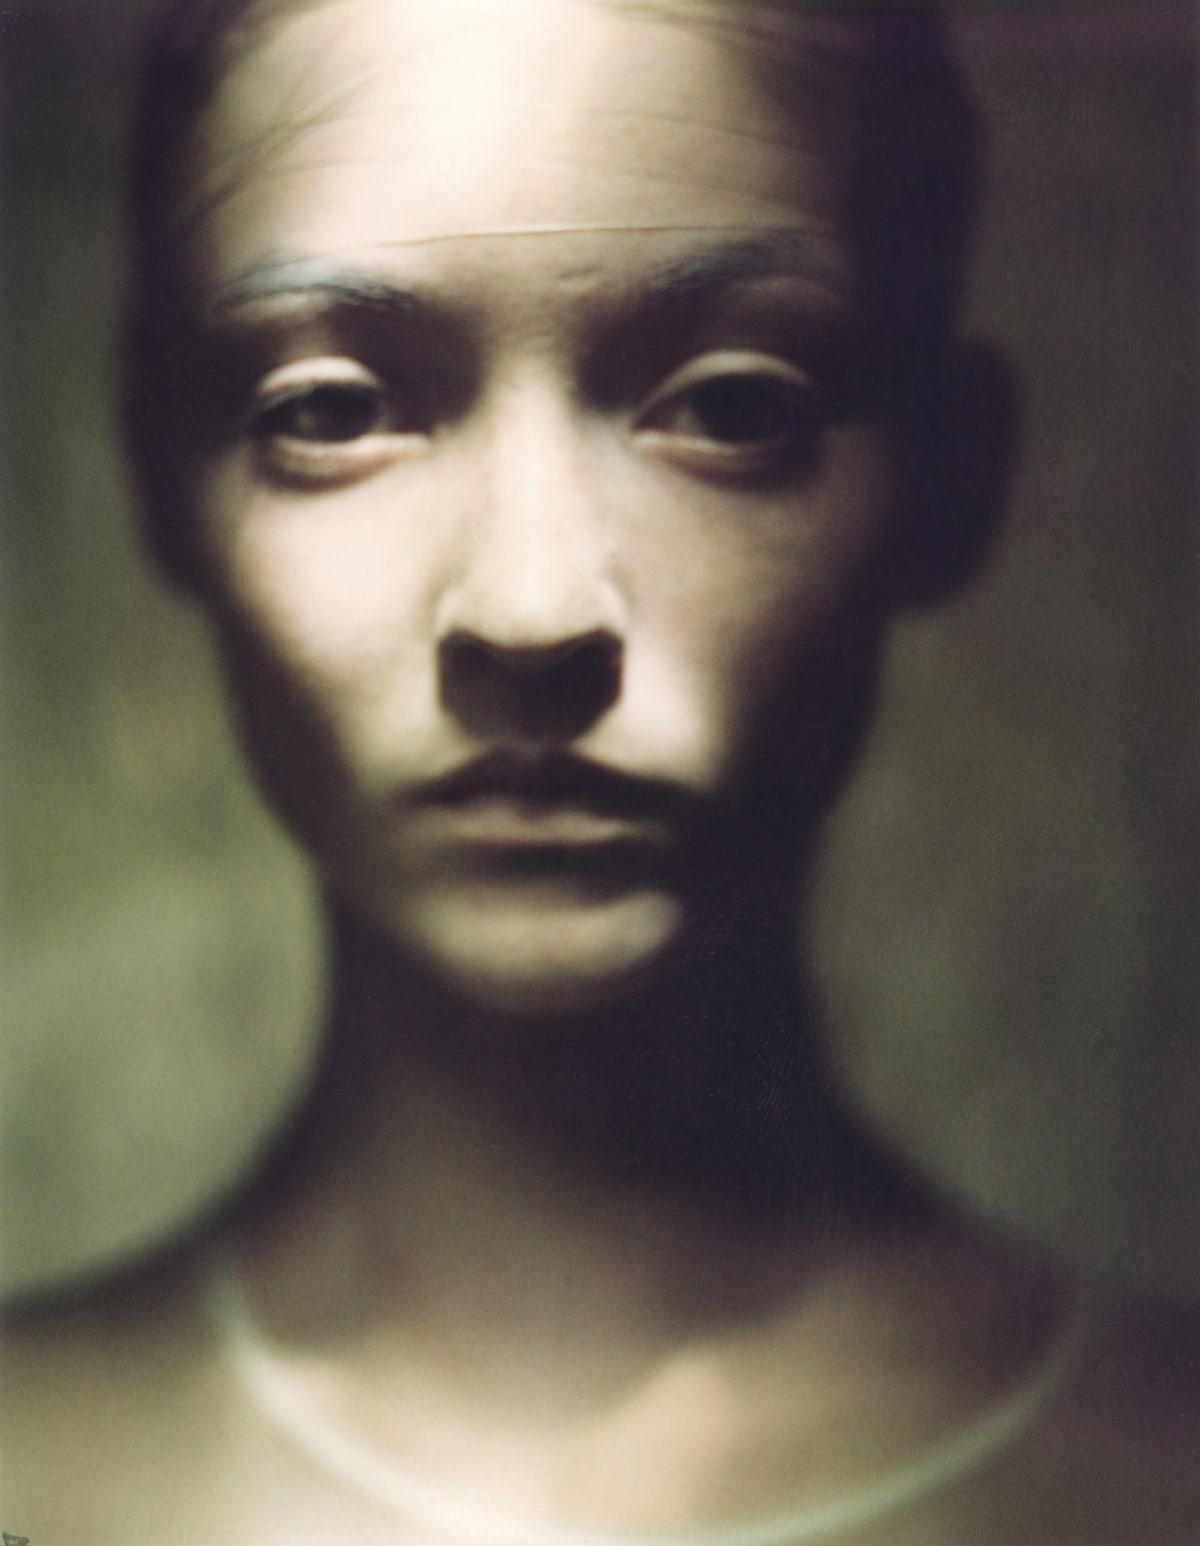 Paolo Roversi, Audrey, Paris, 1996